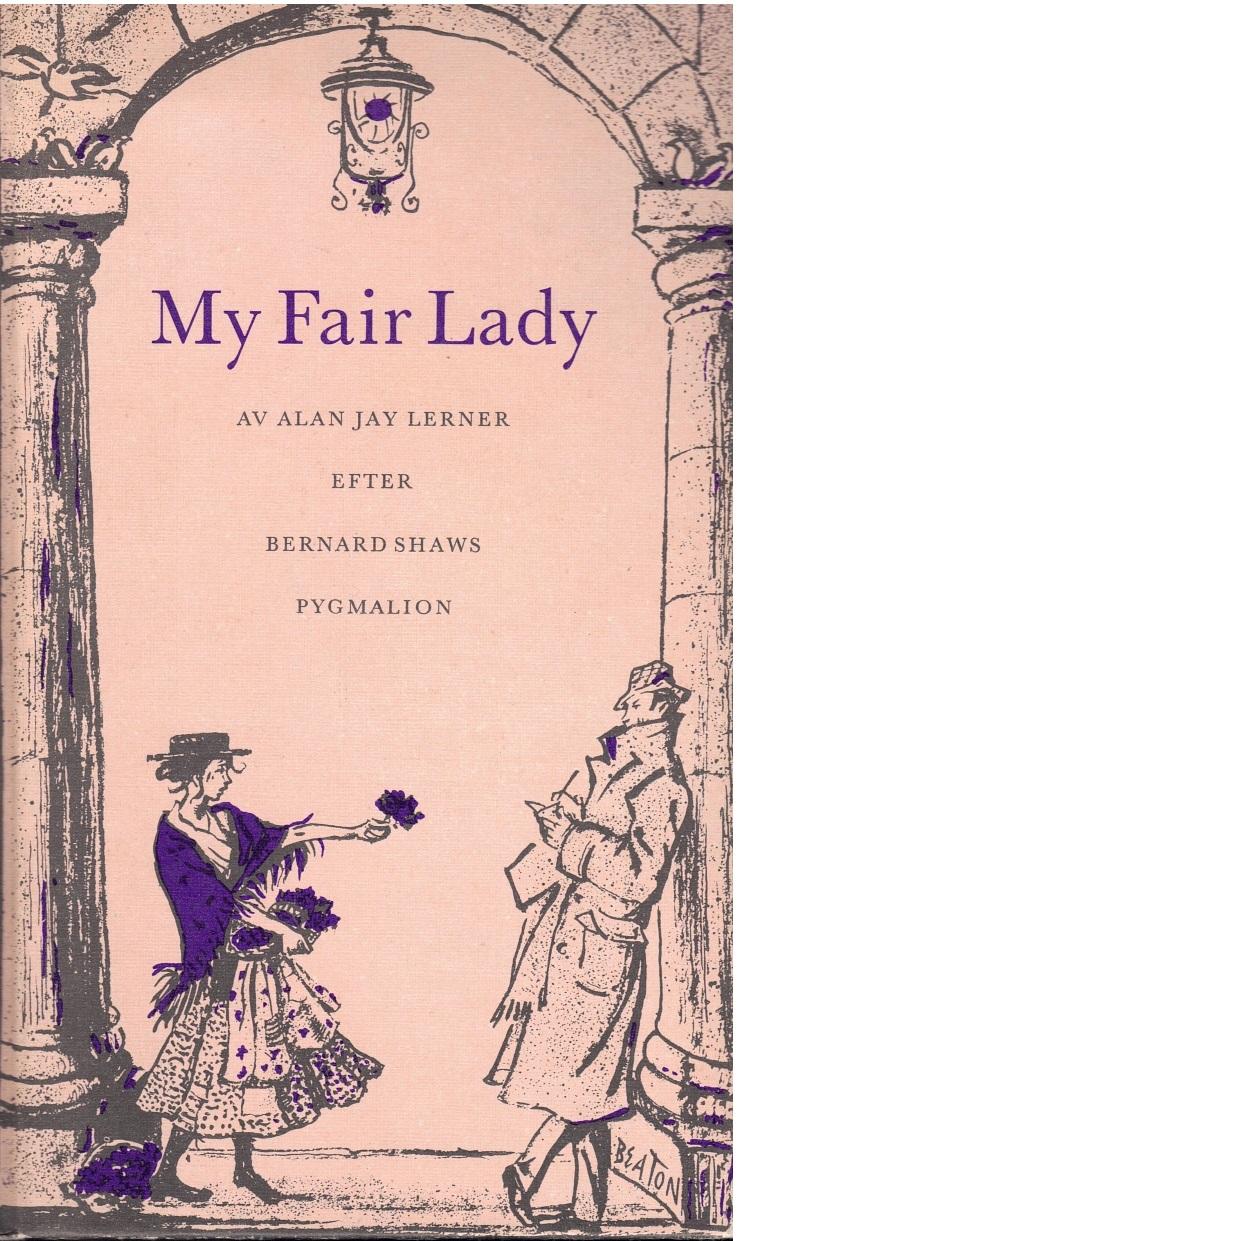 My Fair Lady - Lerner, Alan Jay